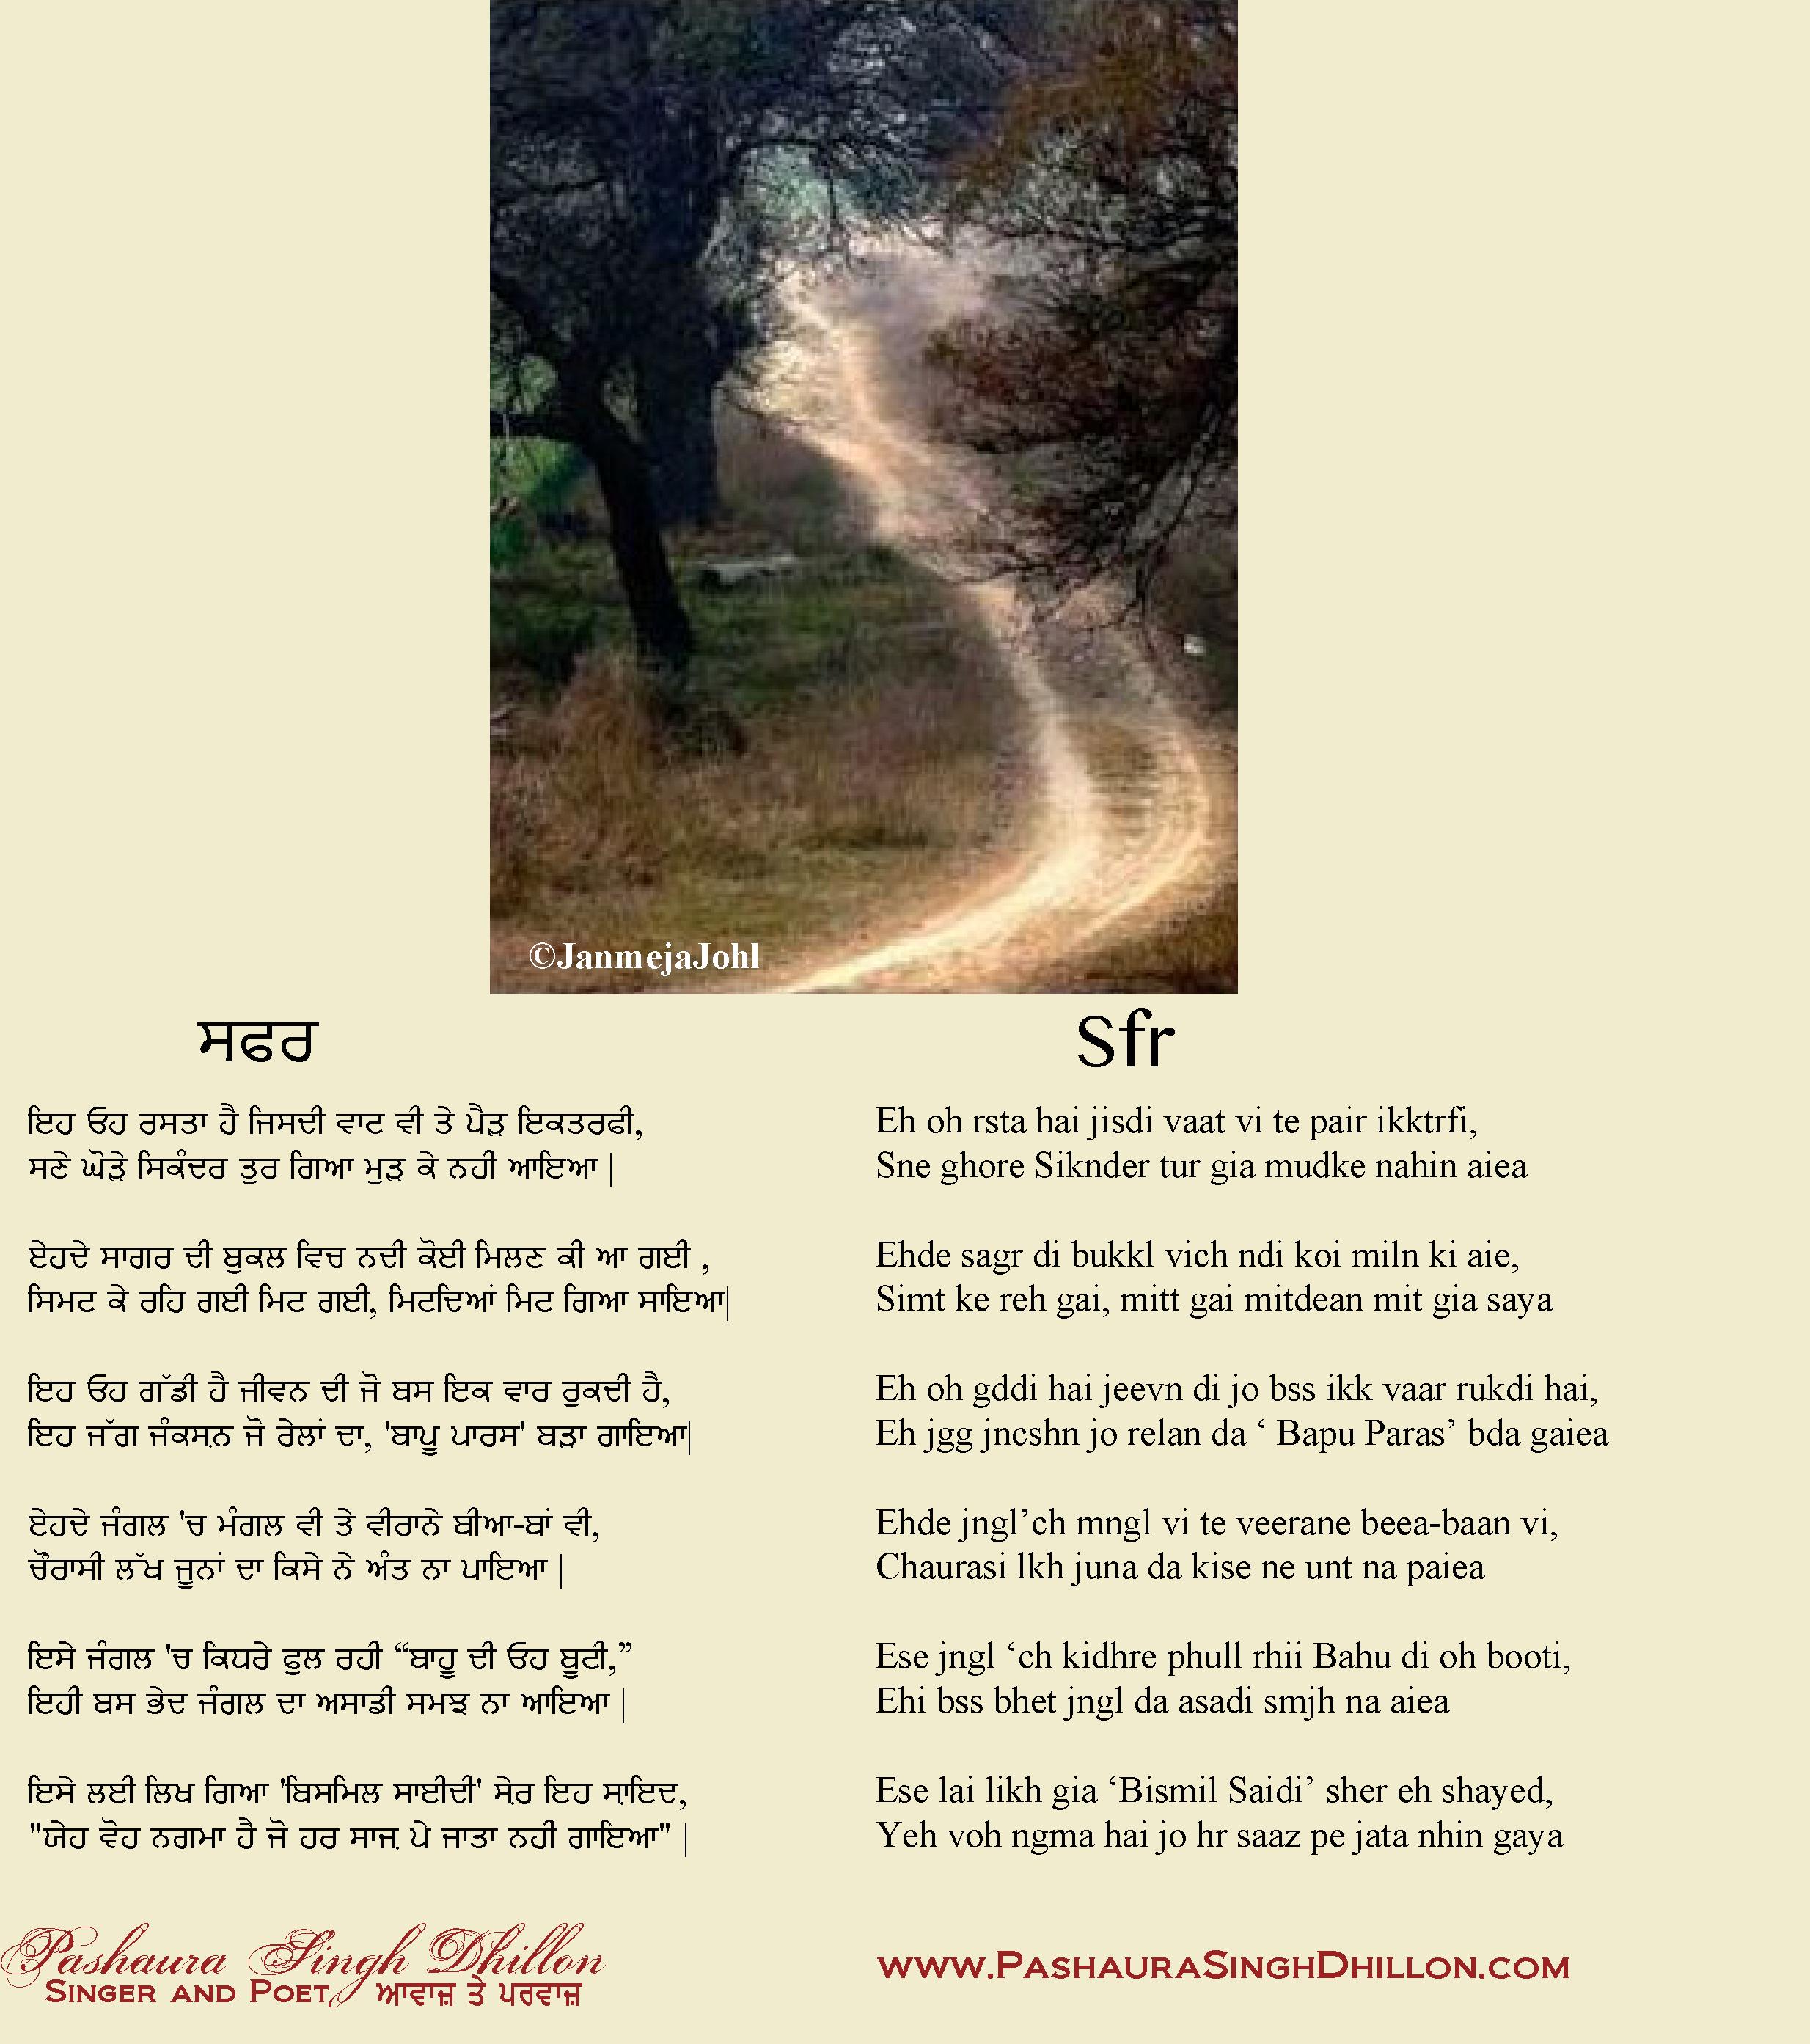 ... in gurmukhi poems punjabi poetry romanized punjabi poems 1 comment